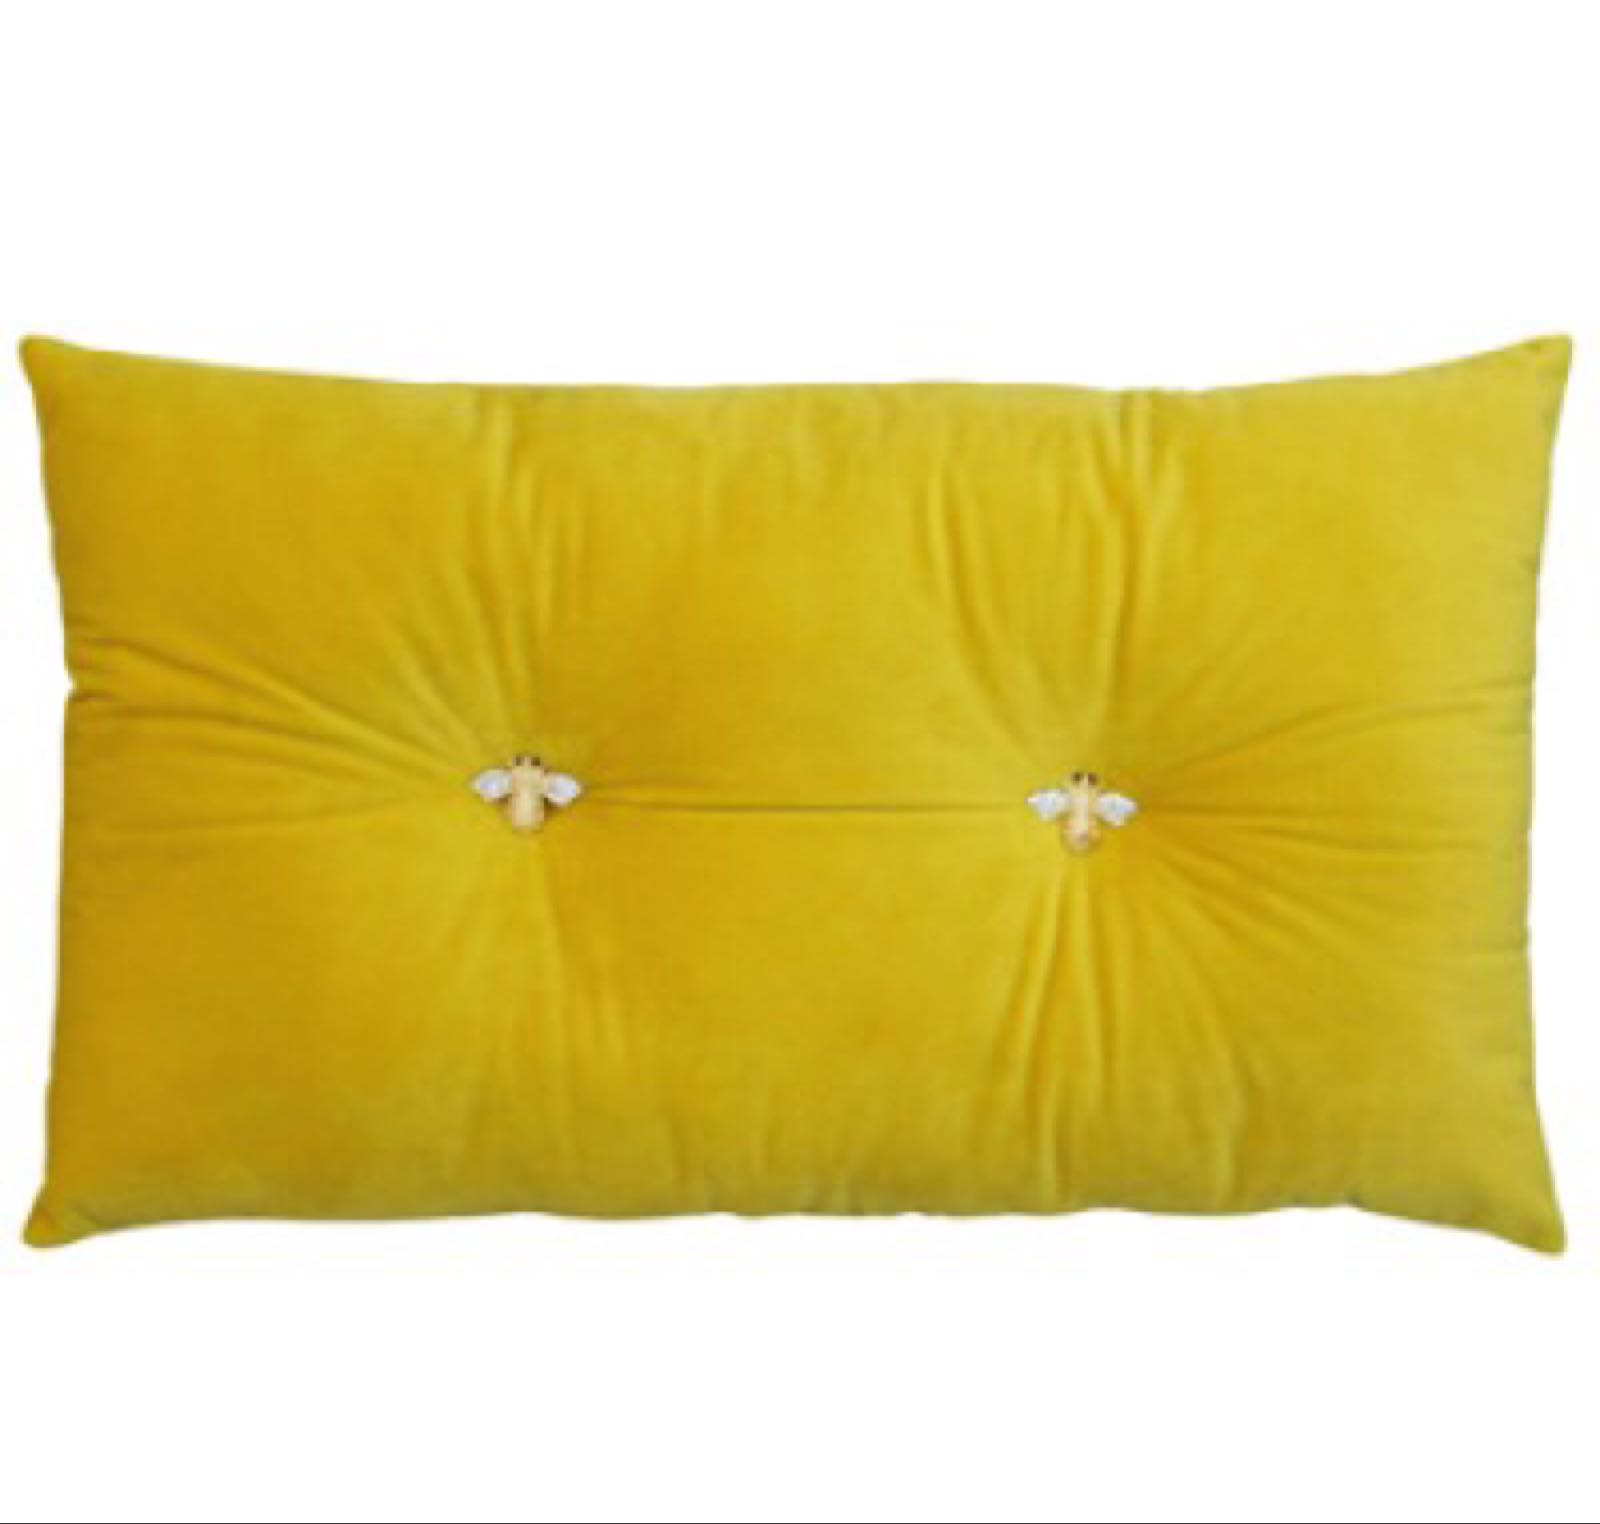 Mustard Bumble Bee Cushion 47cm x 30cm